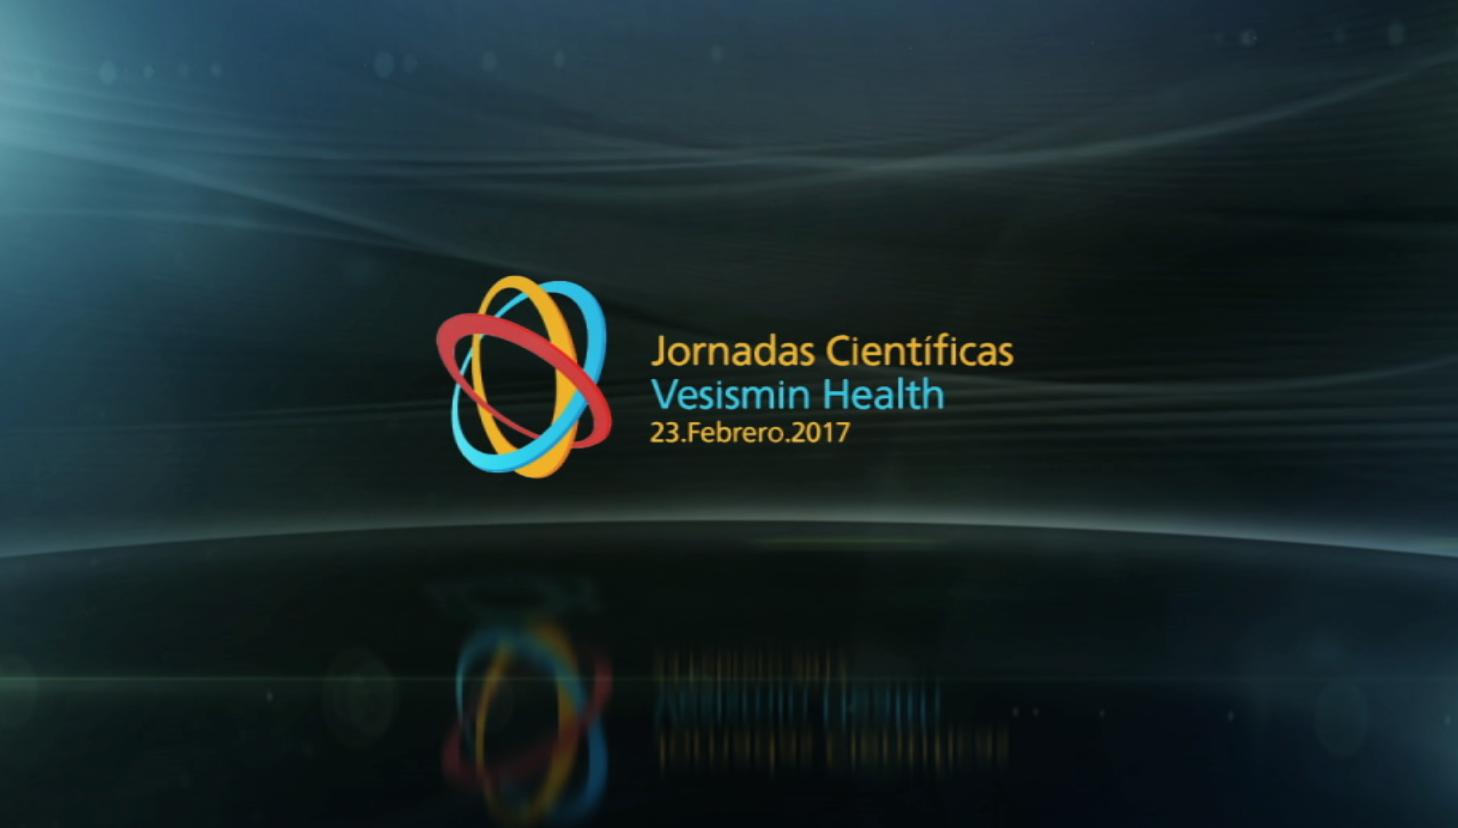 I Jornada Científica de Vesismin Health